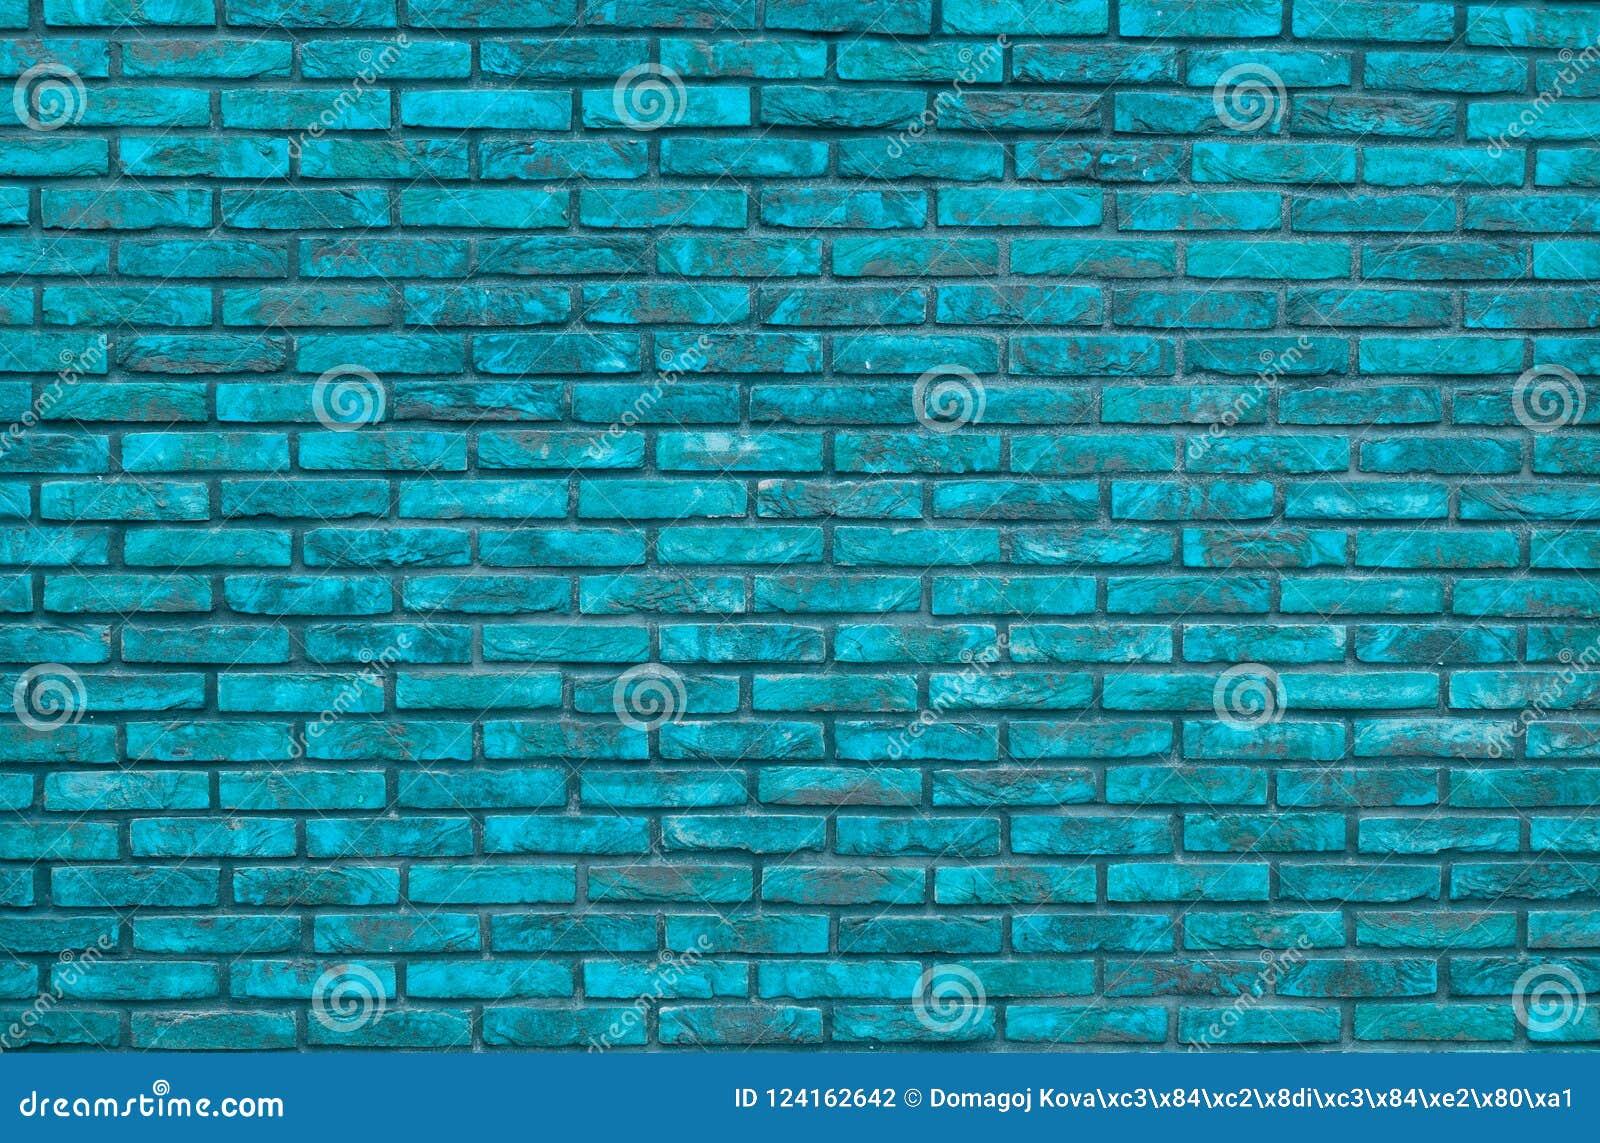 Vibrant Blue Brick Wall Background Wallpaper Bricks Pattern TextureVibrant